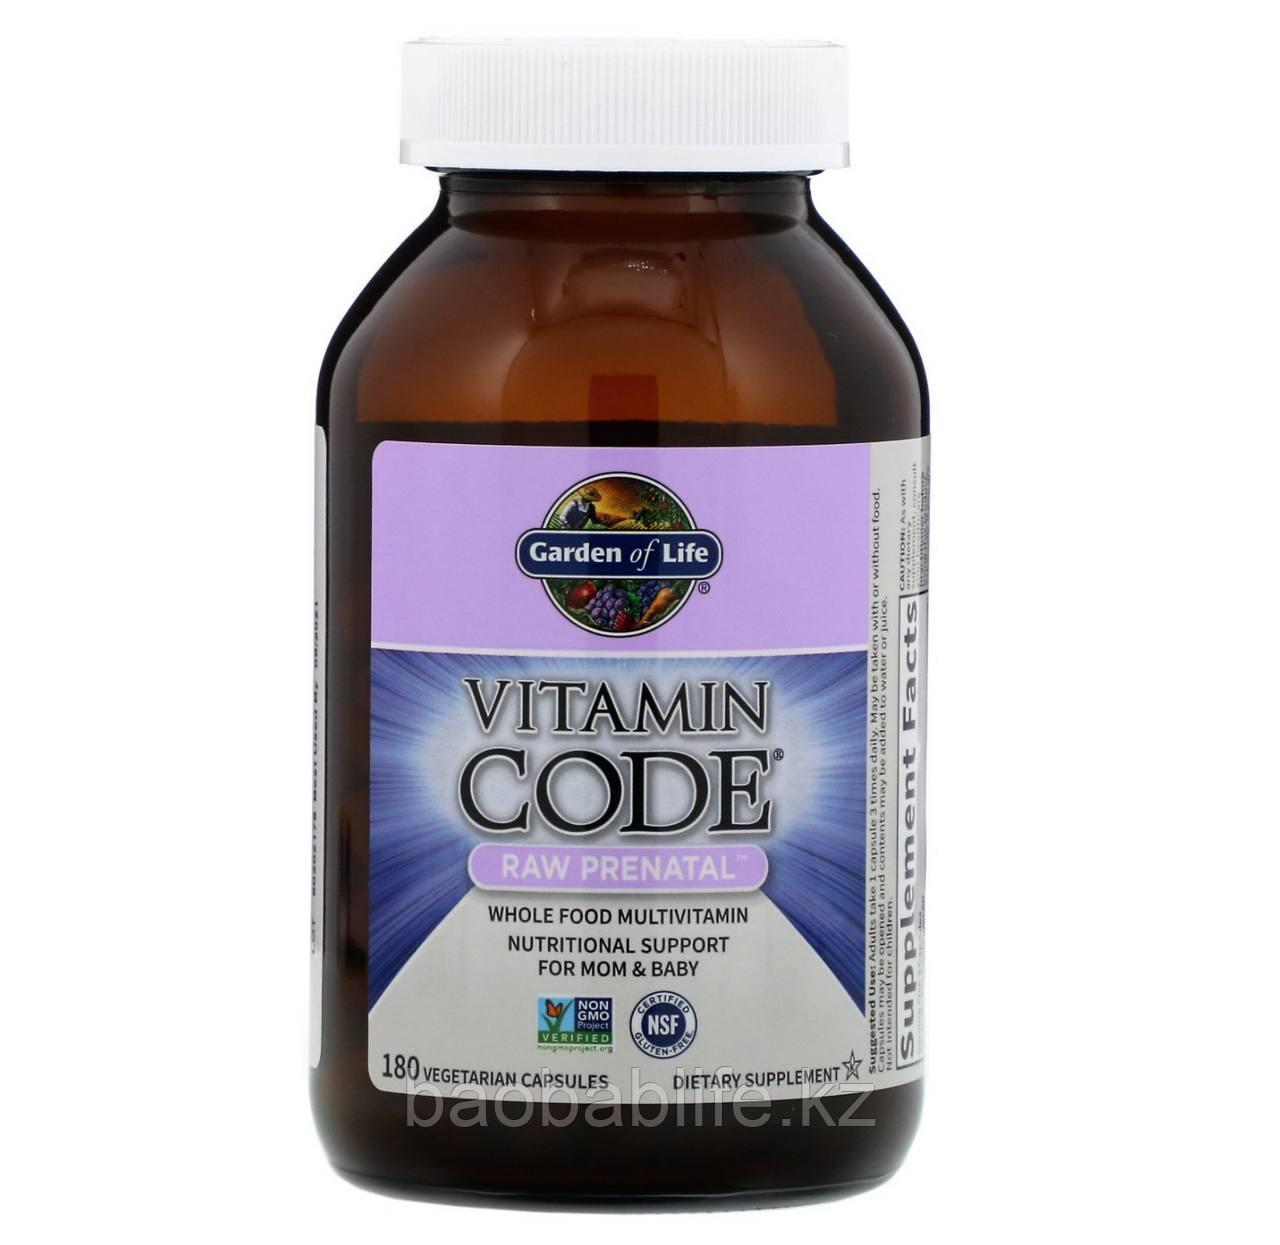 Vitamin Code витамины для беременных 180 капсул. Raw prenatal